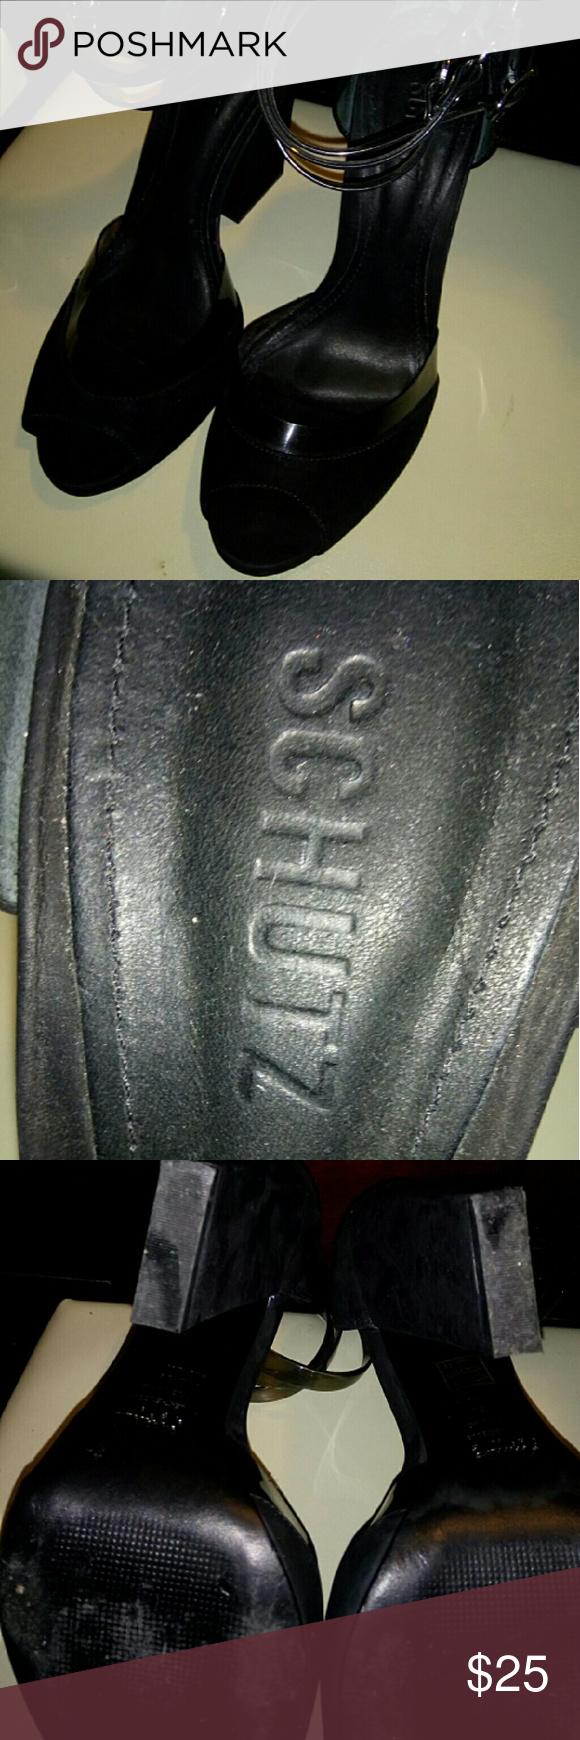 Schutz Shoes Schutz High heel shoe, size 10. Just worn once, l?ke new SCHUTZ Shoes Heels